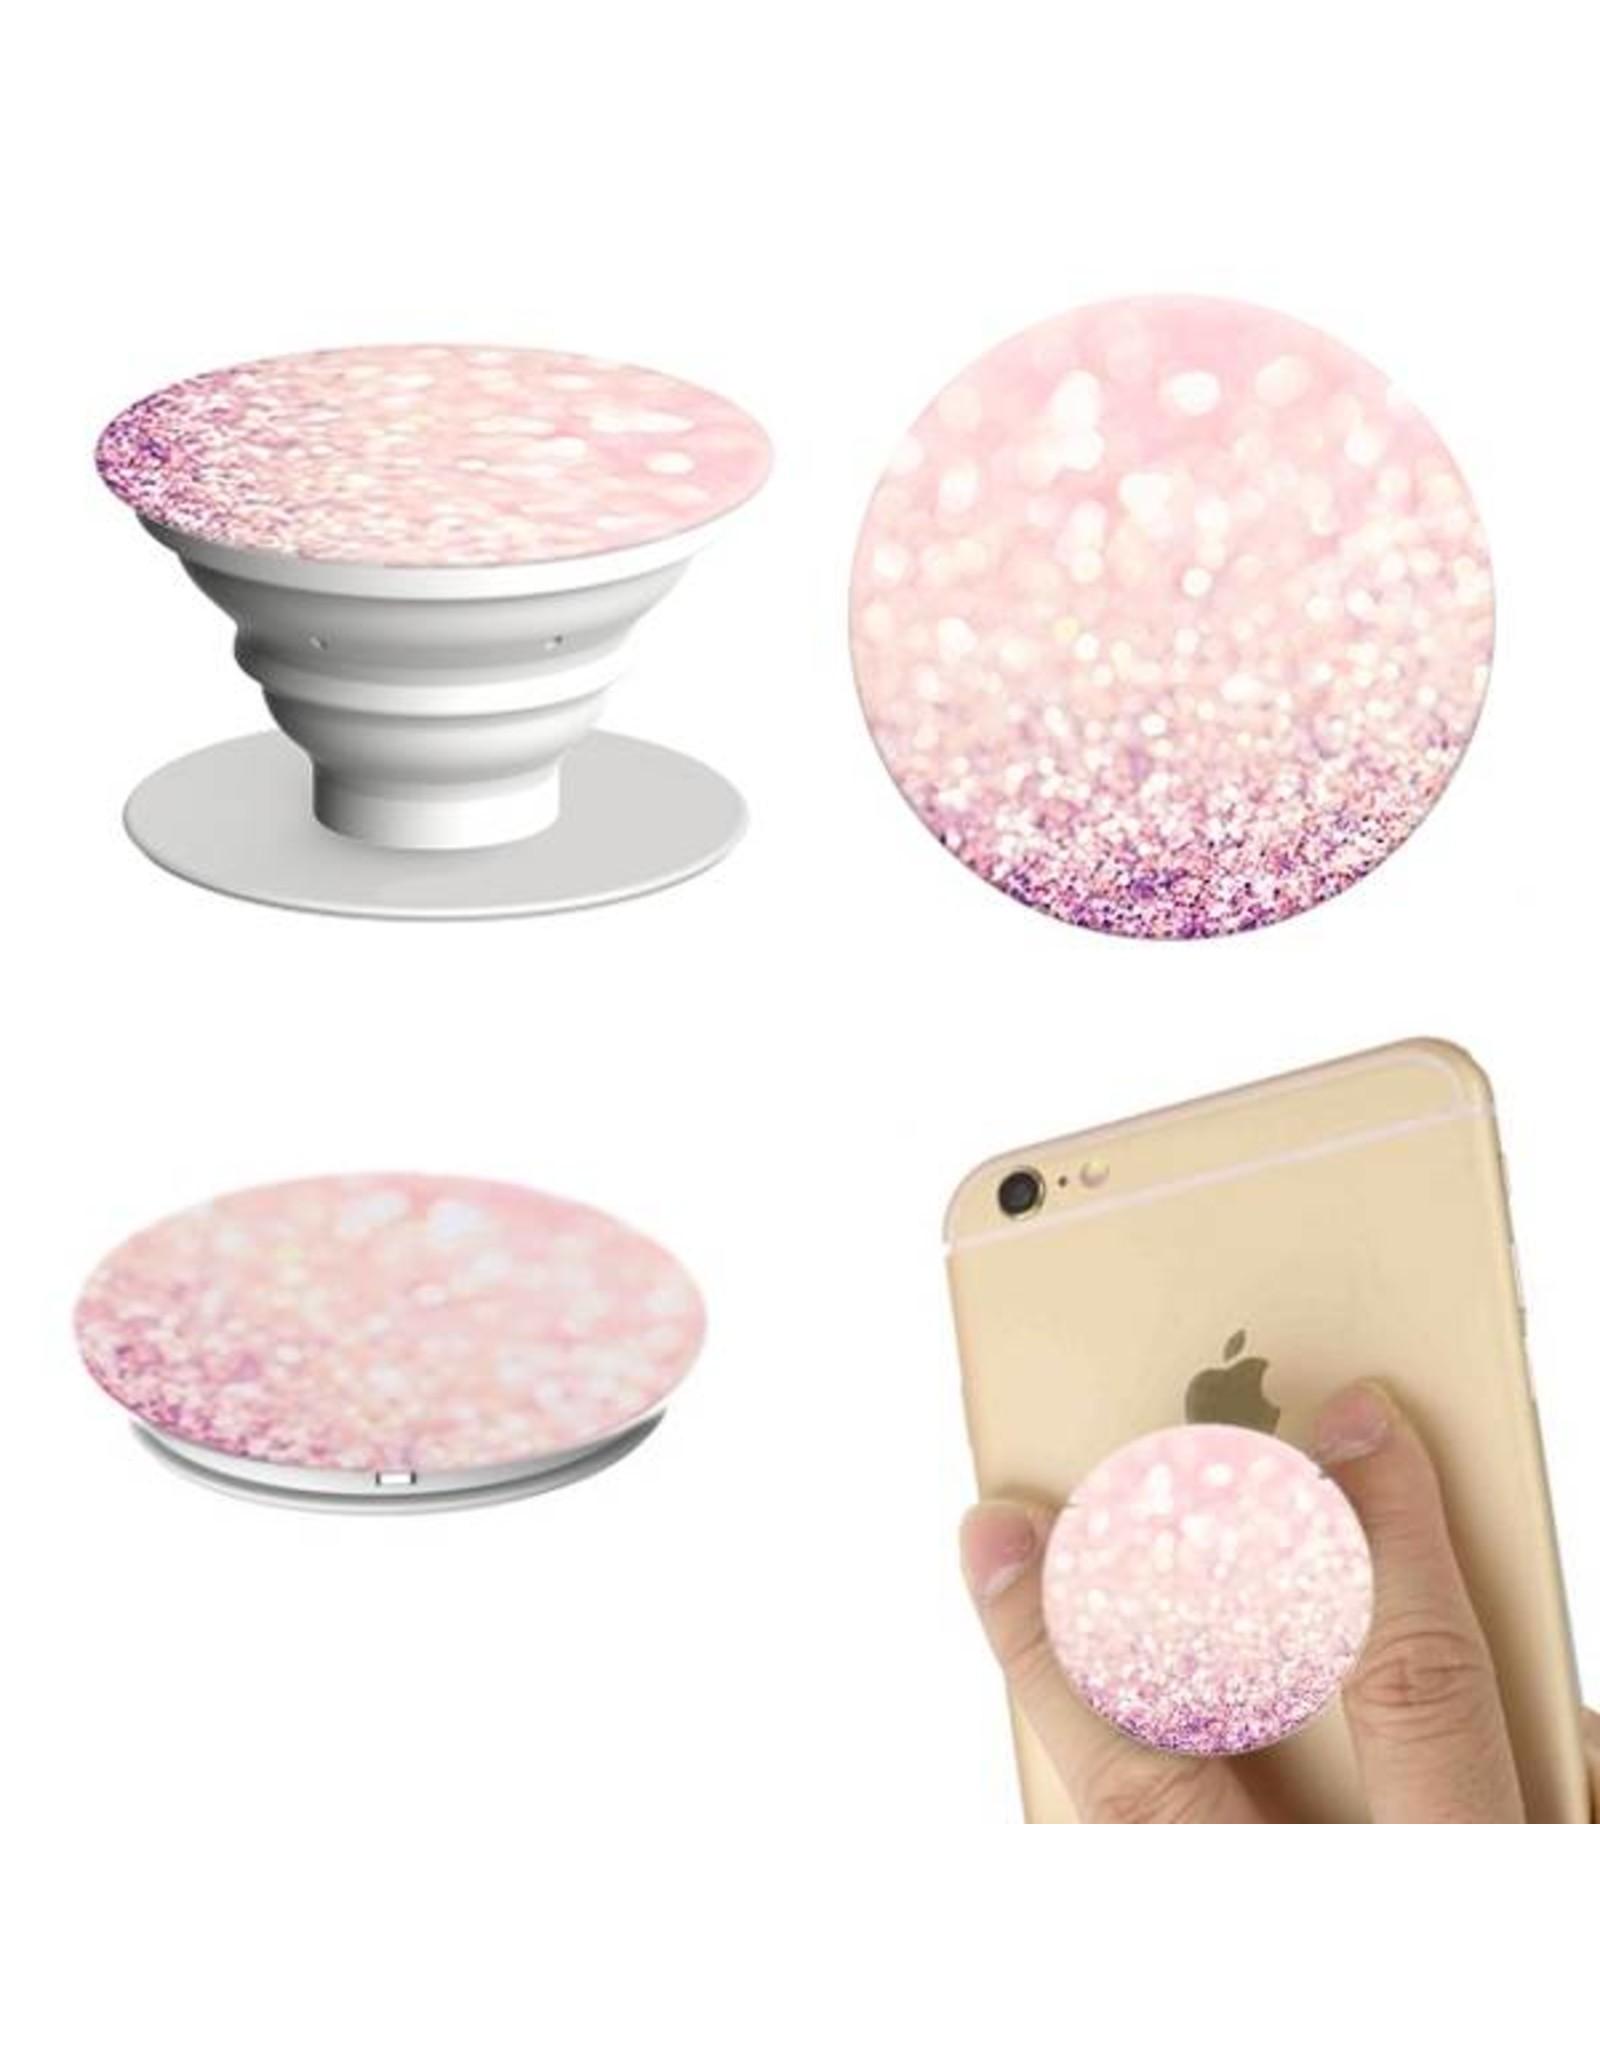 Telefoonbutton 'Pink Sand' - Body & Soap